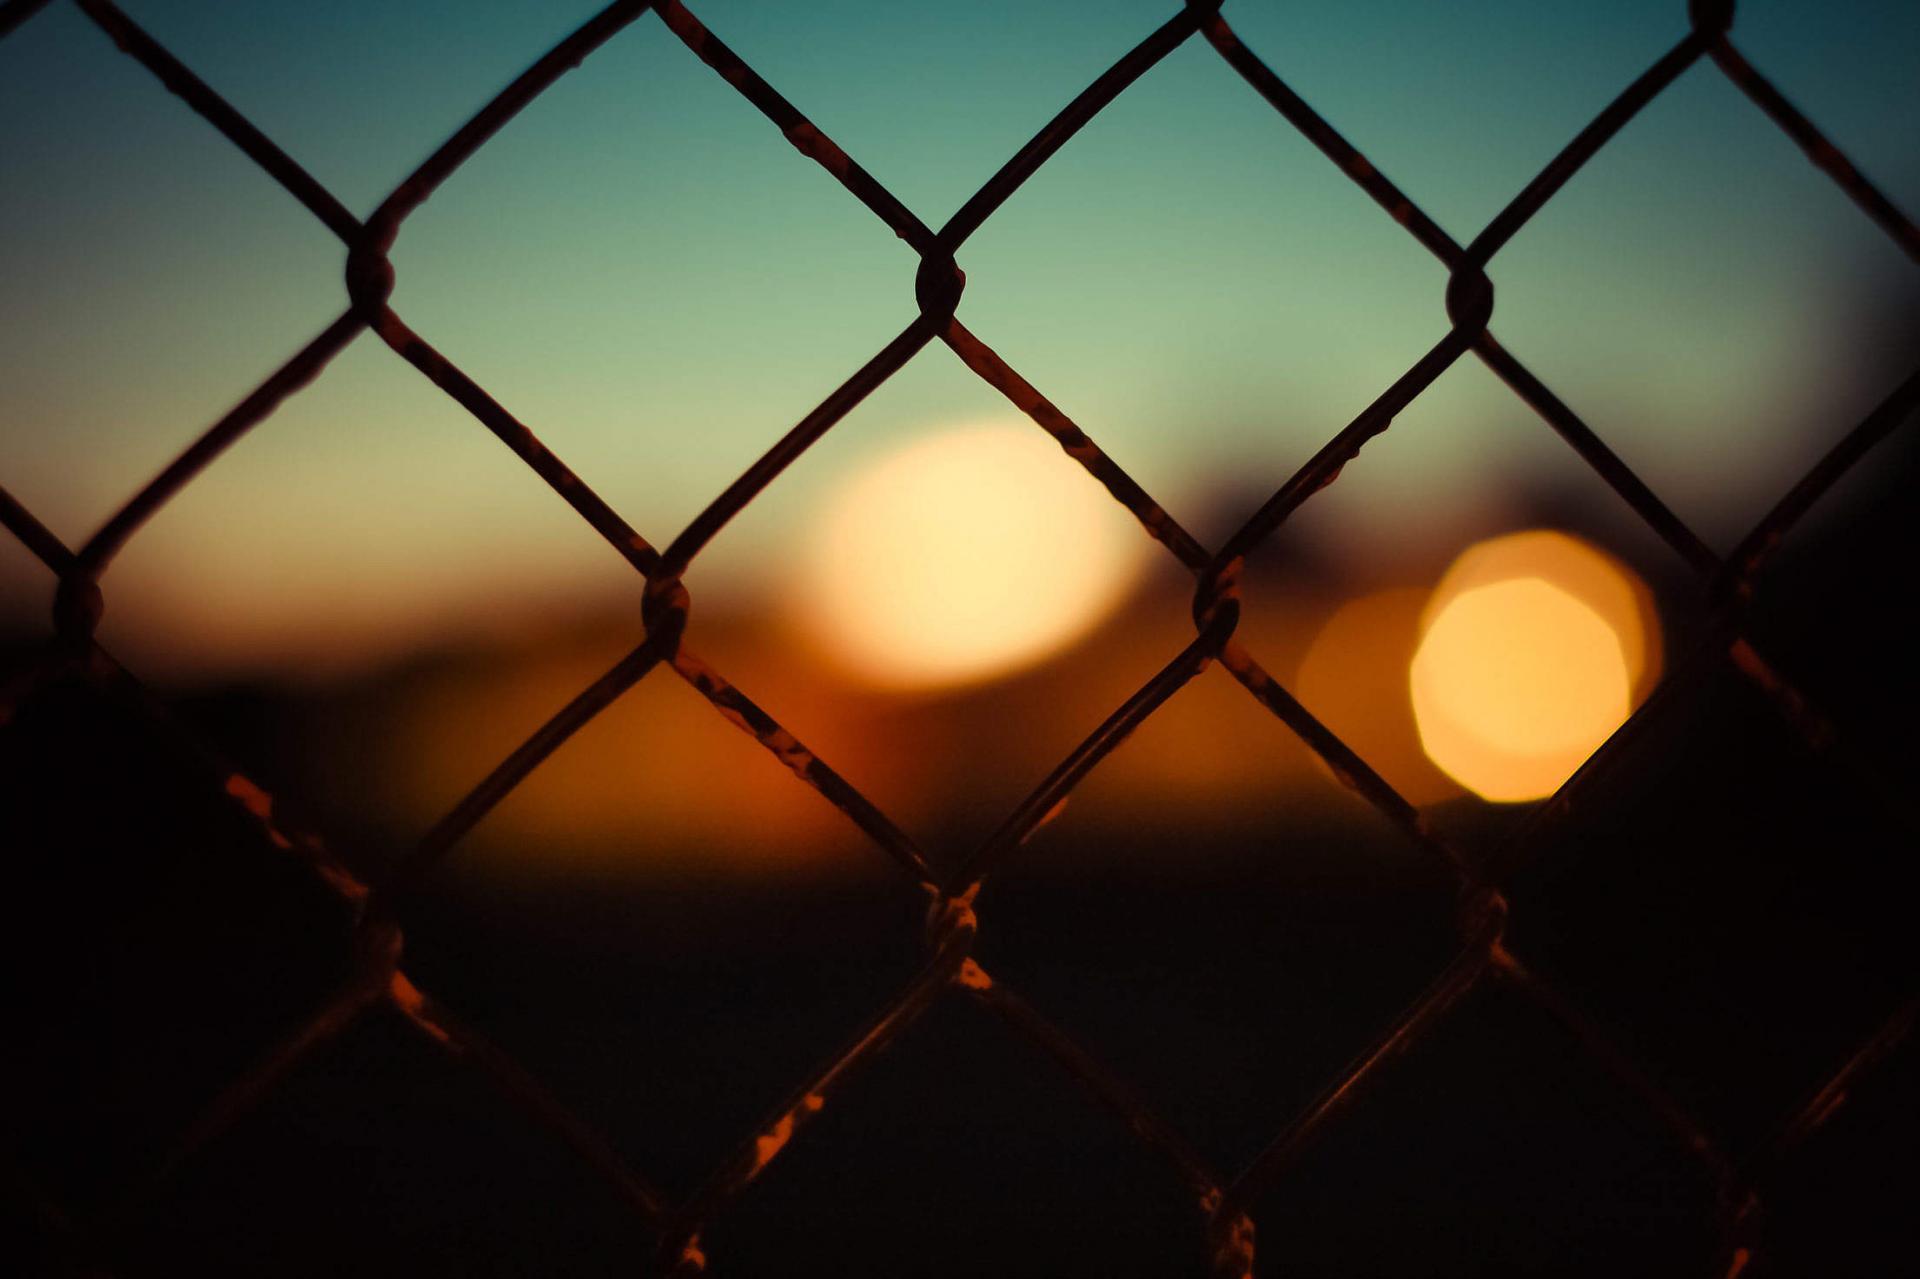 Abstract bokeh through a fence free stock photos picjumbo img 0714 2210x1473